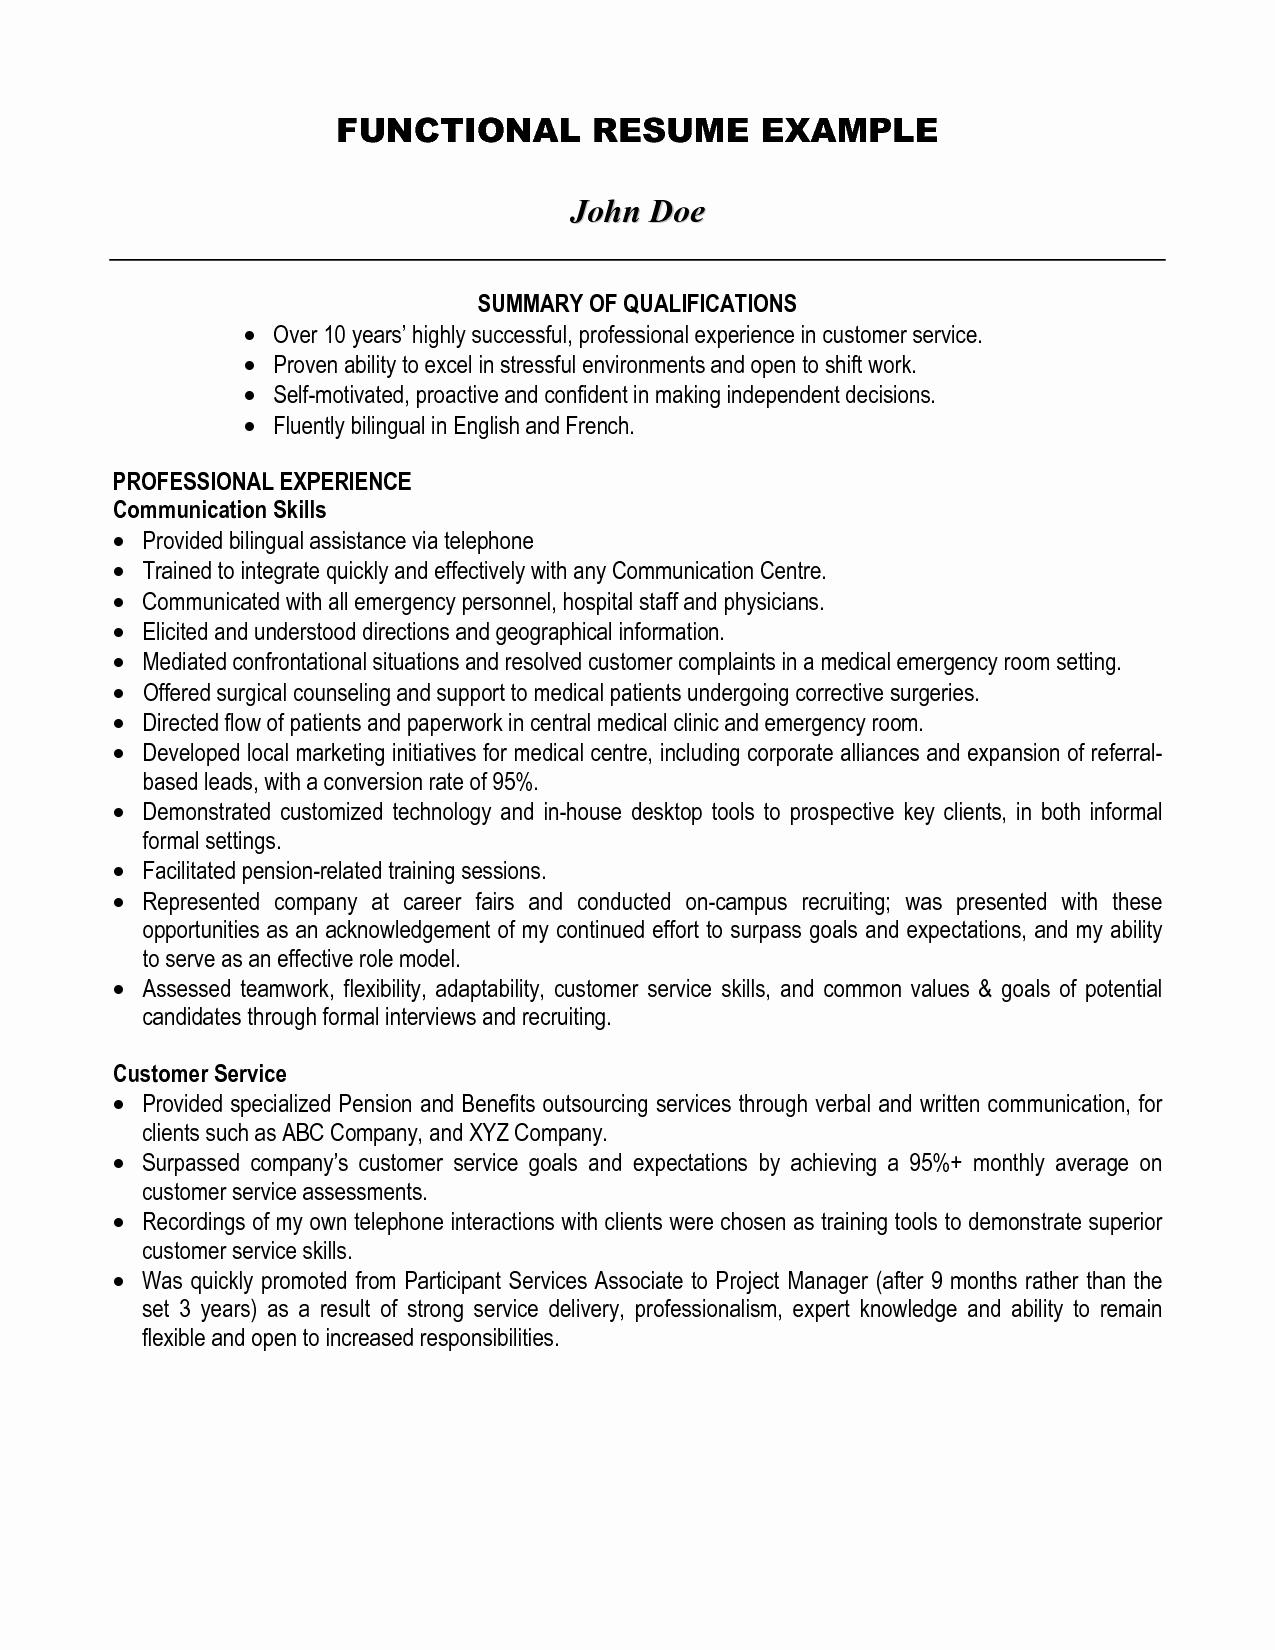 Resume Examples Professional Summary